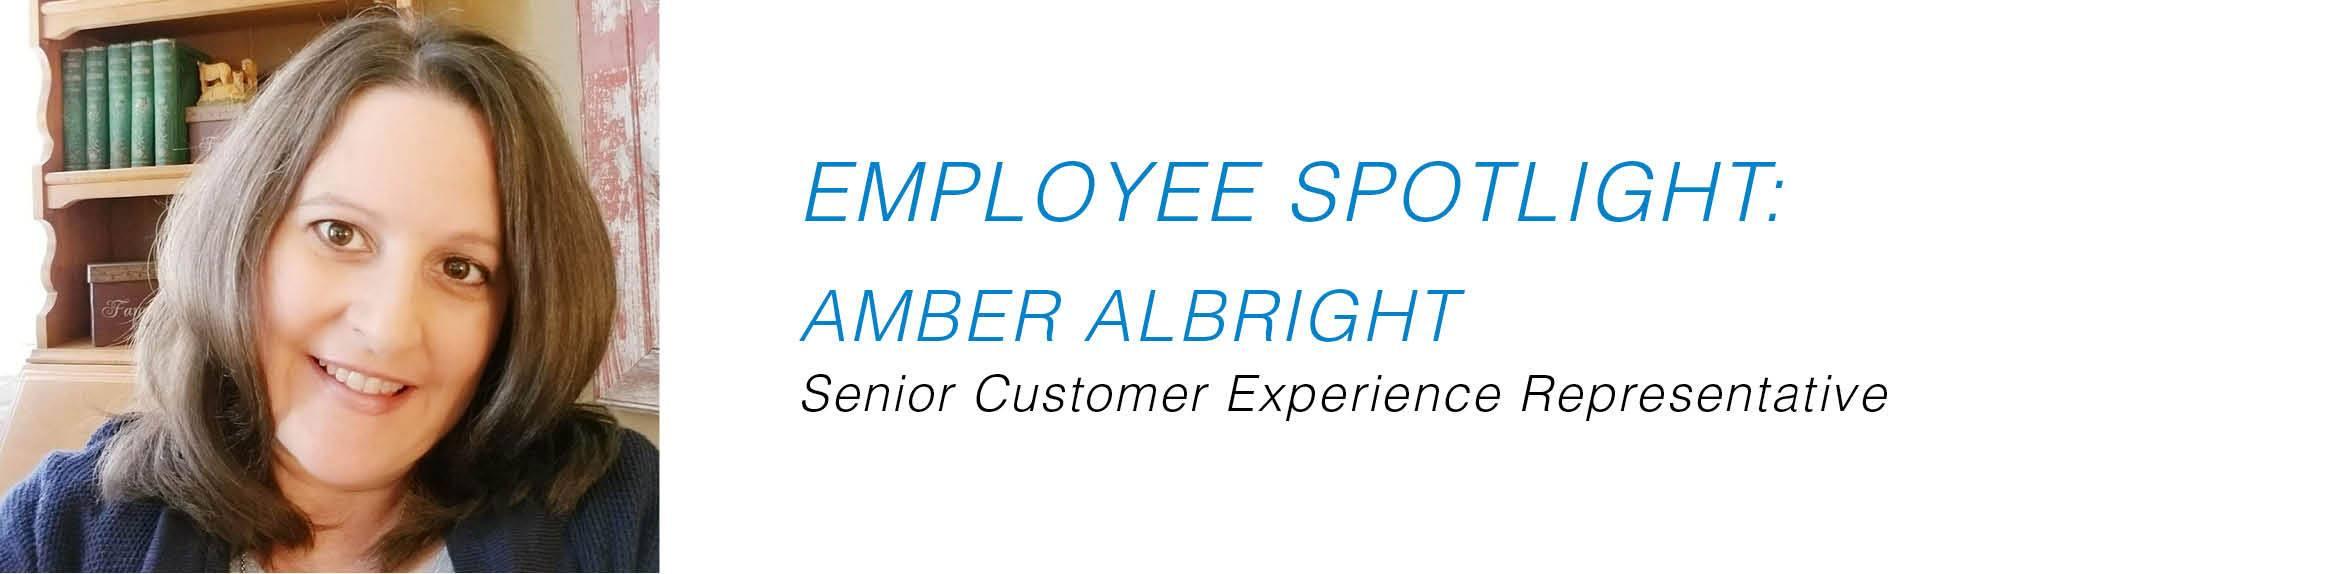 Employee Spotlight - Amber Albright